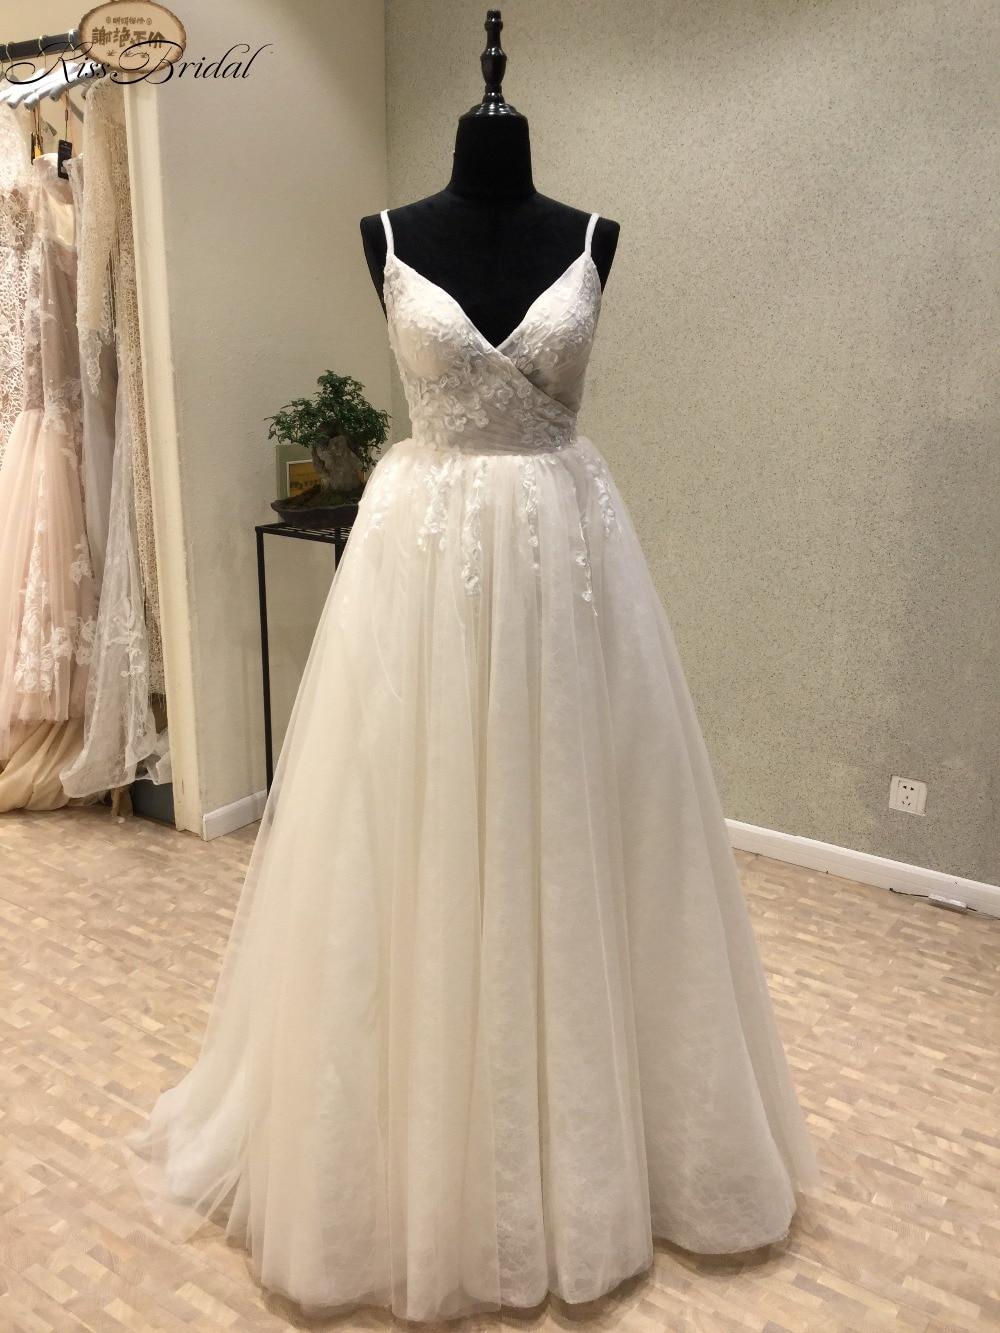 Buy new fabulous long wedding dress 2018 for Buying wedding dress from china